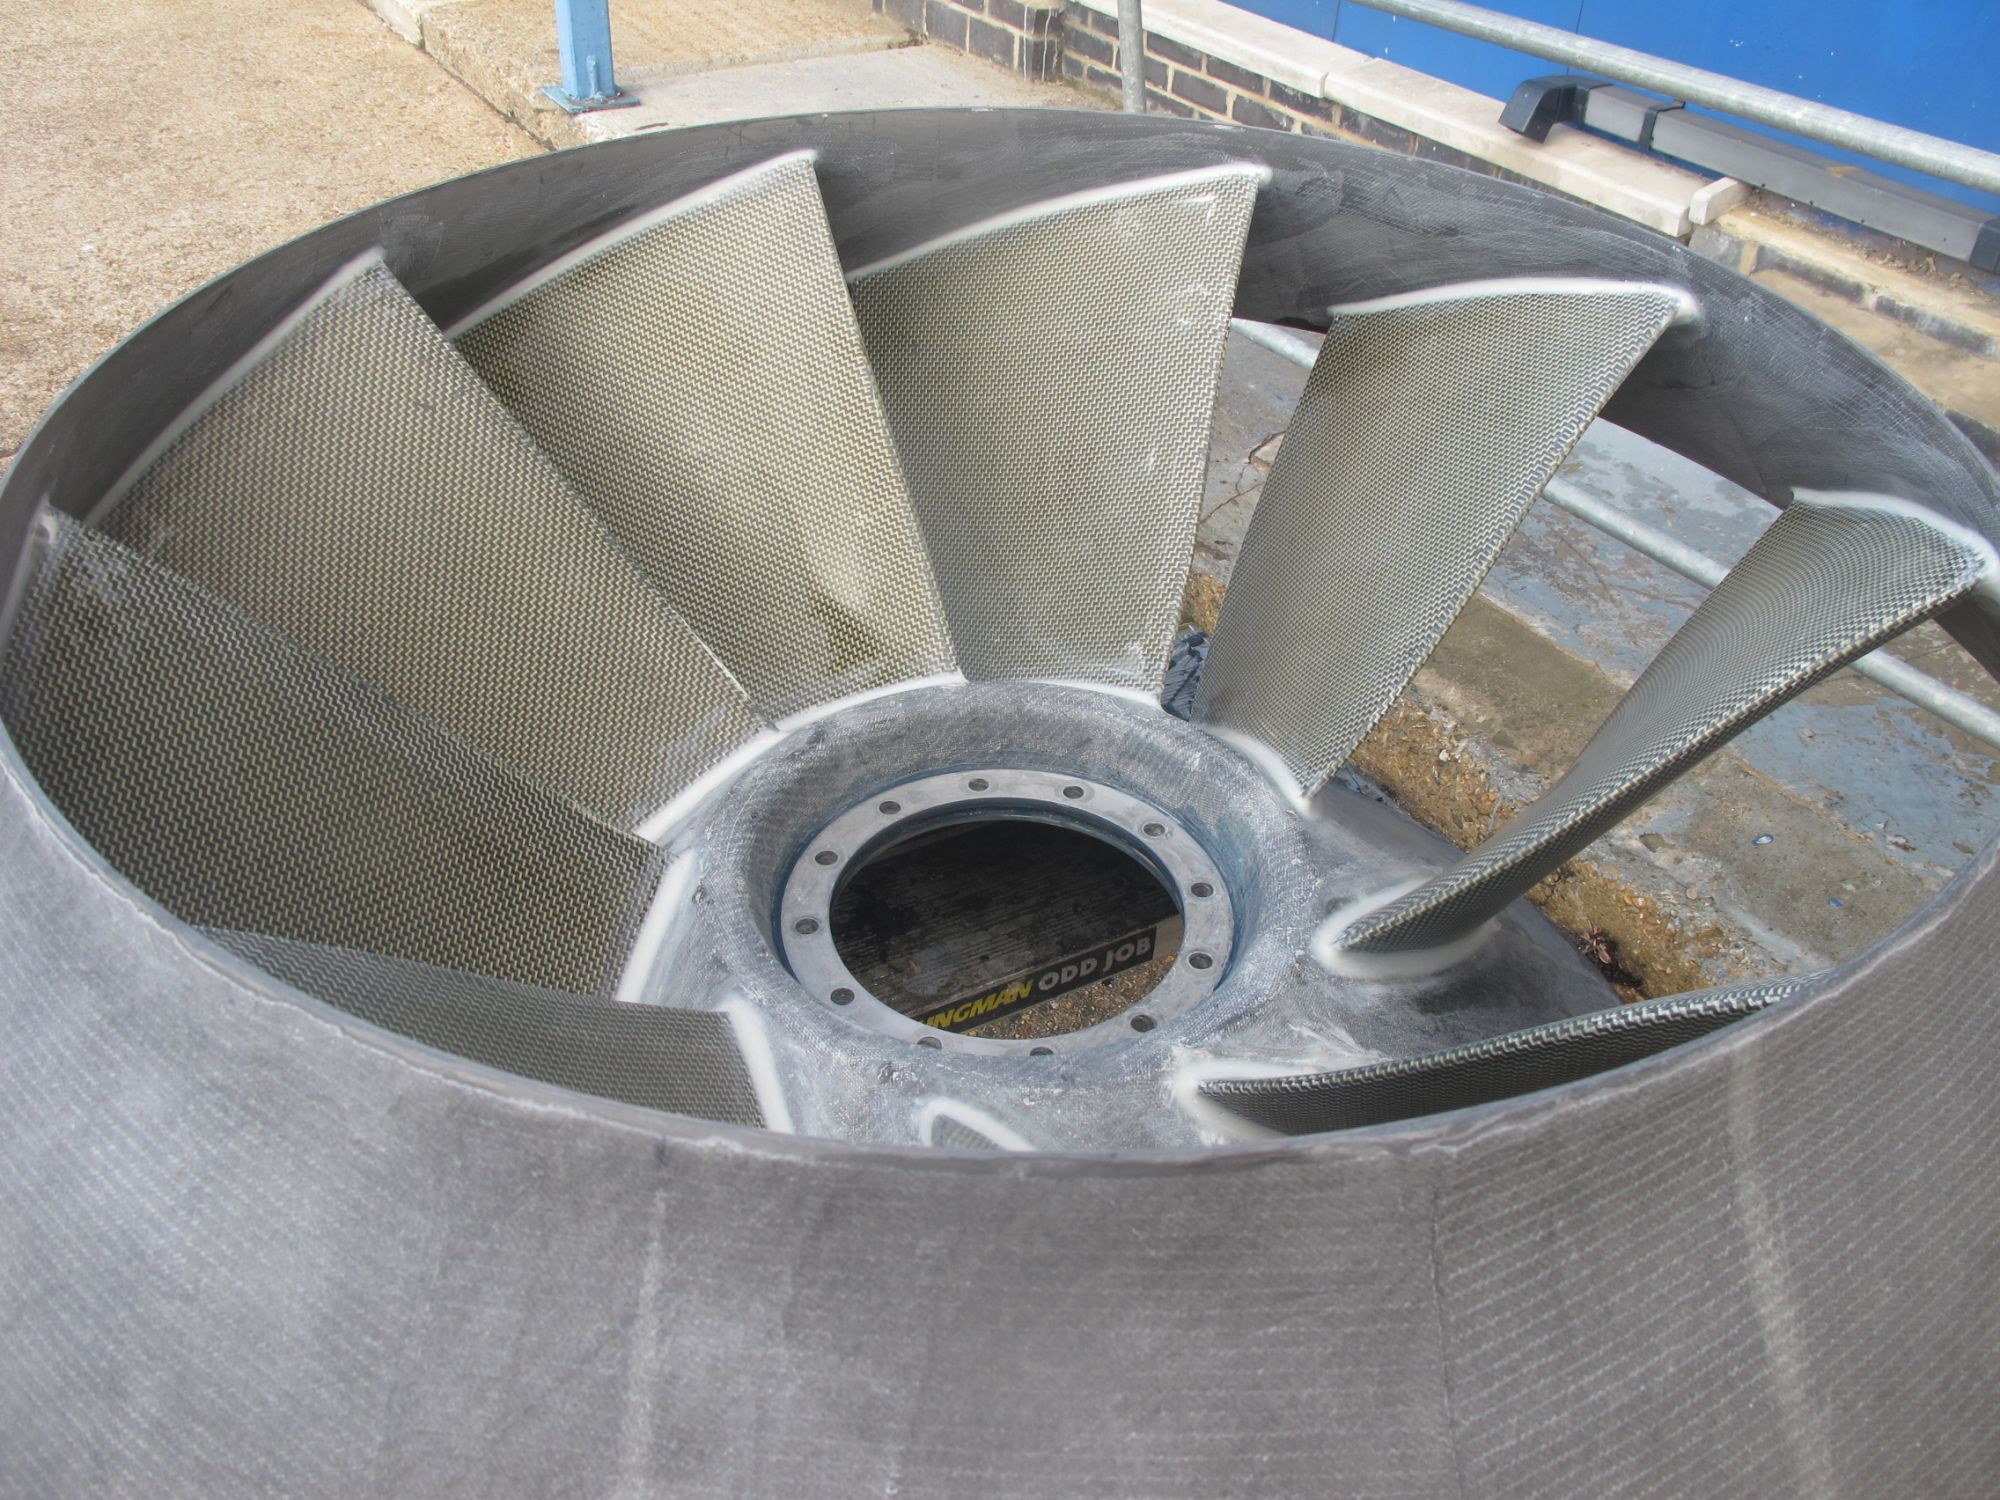 Hovercraft fan duct